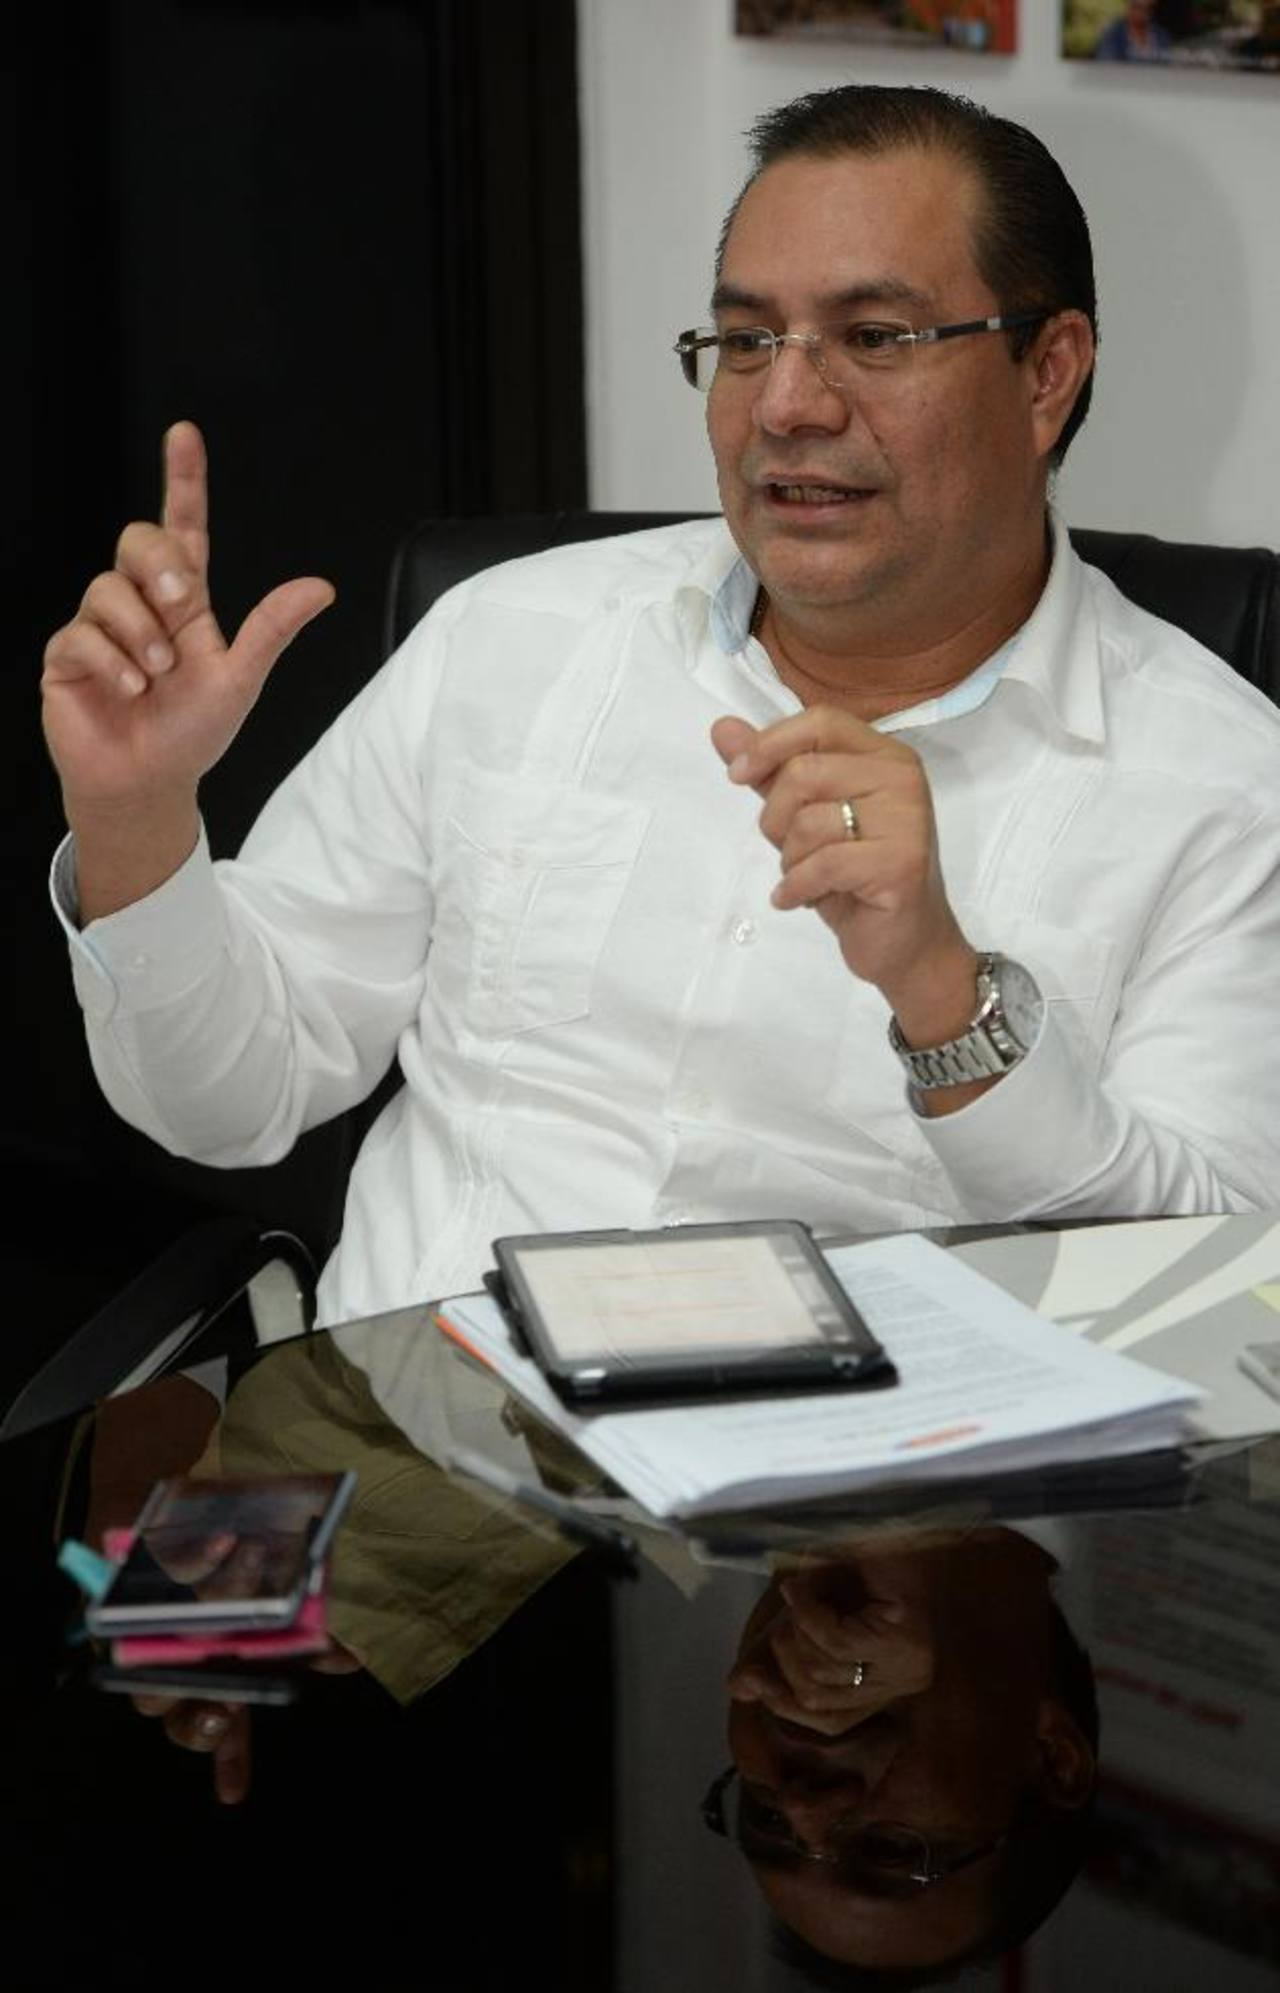 Rivas aseguró que Fovial innova cada año e inicia con una buena planificación. edh / JAIME Anaya